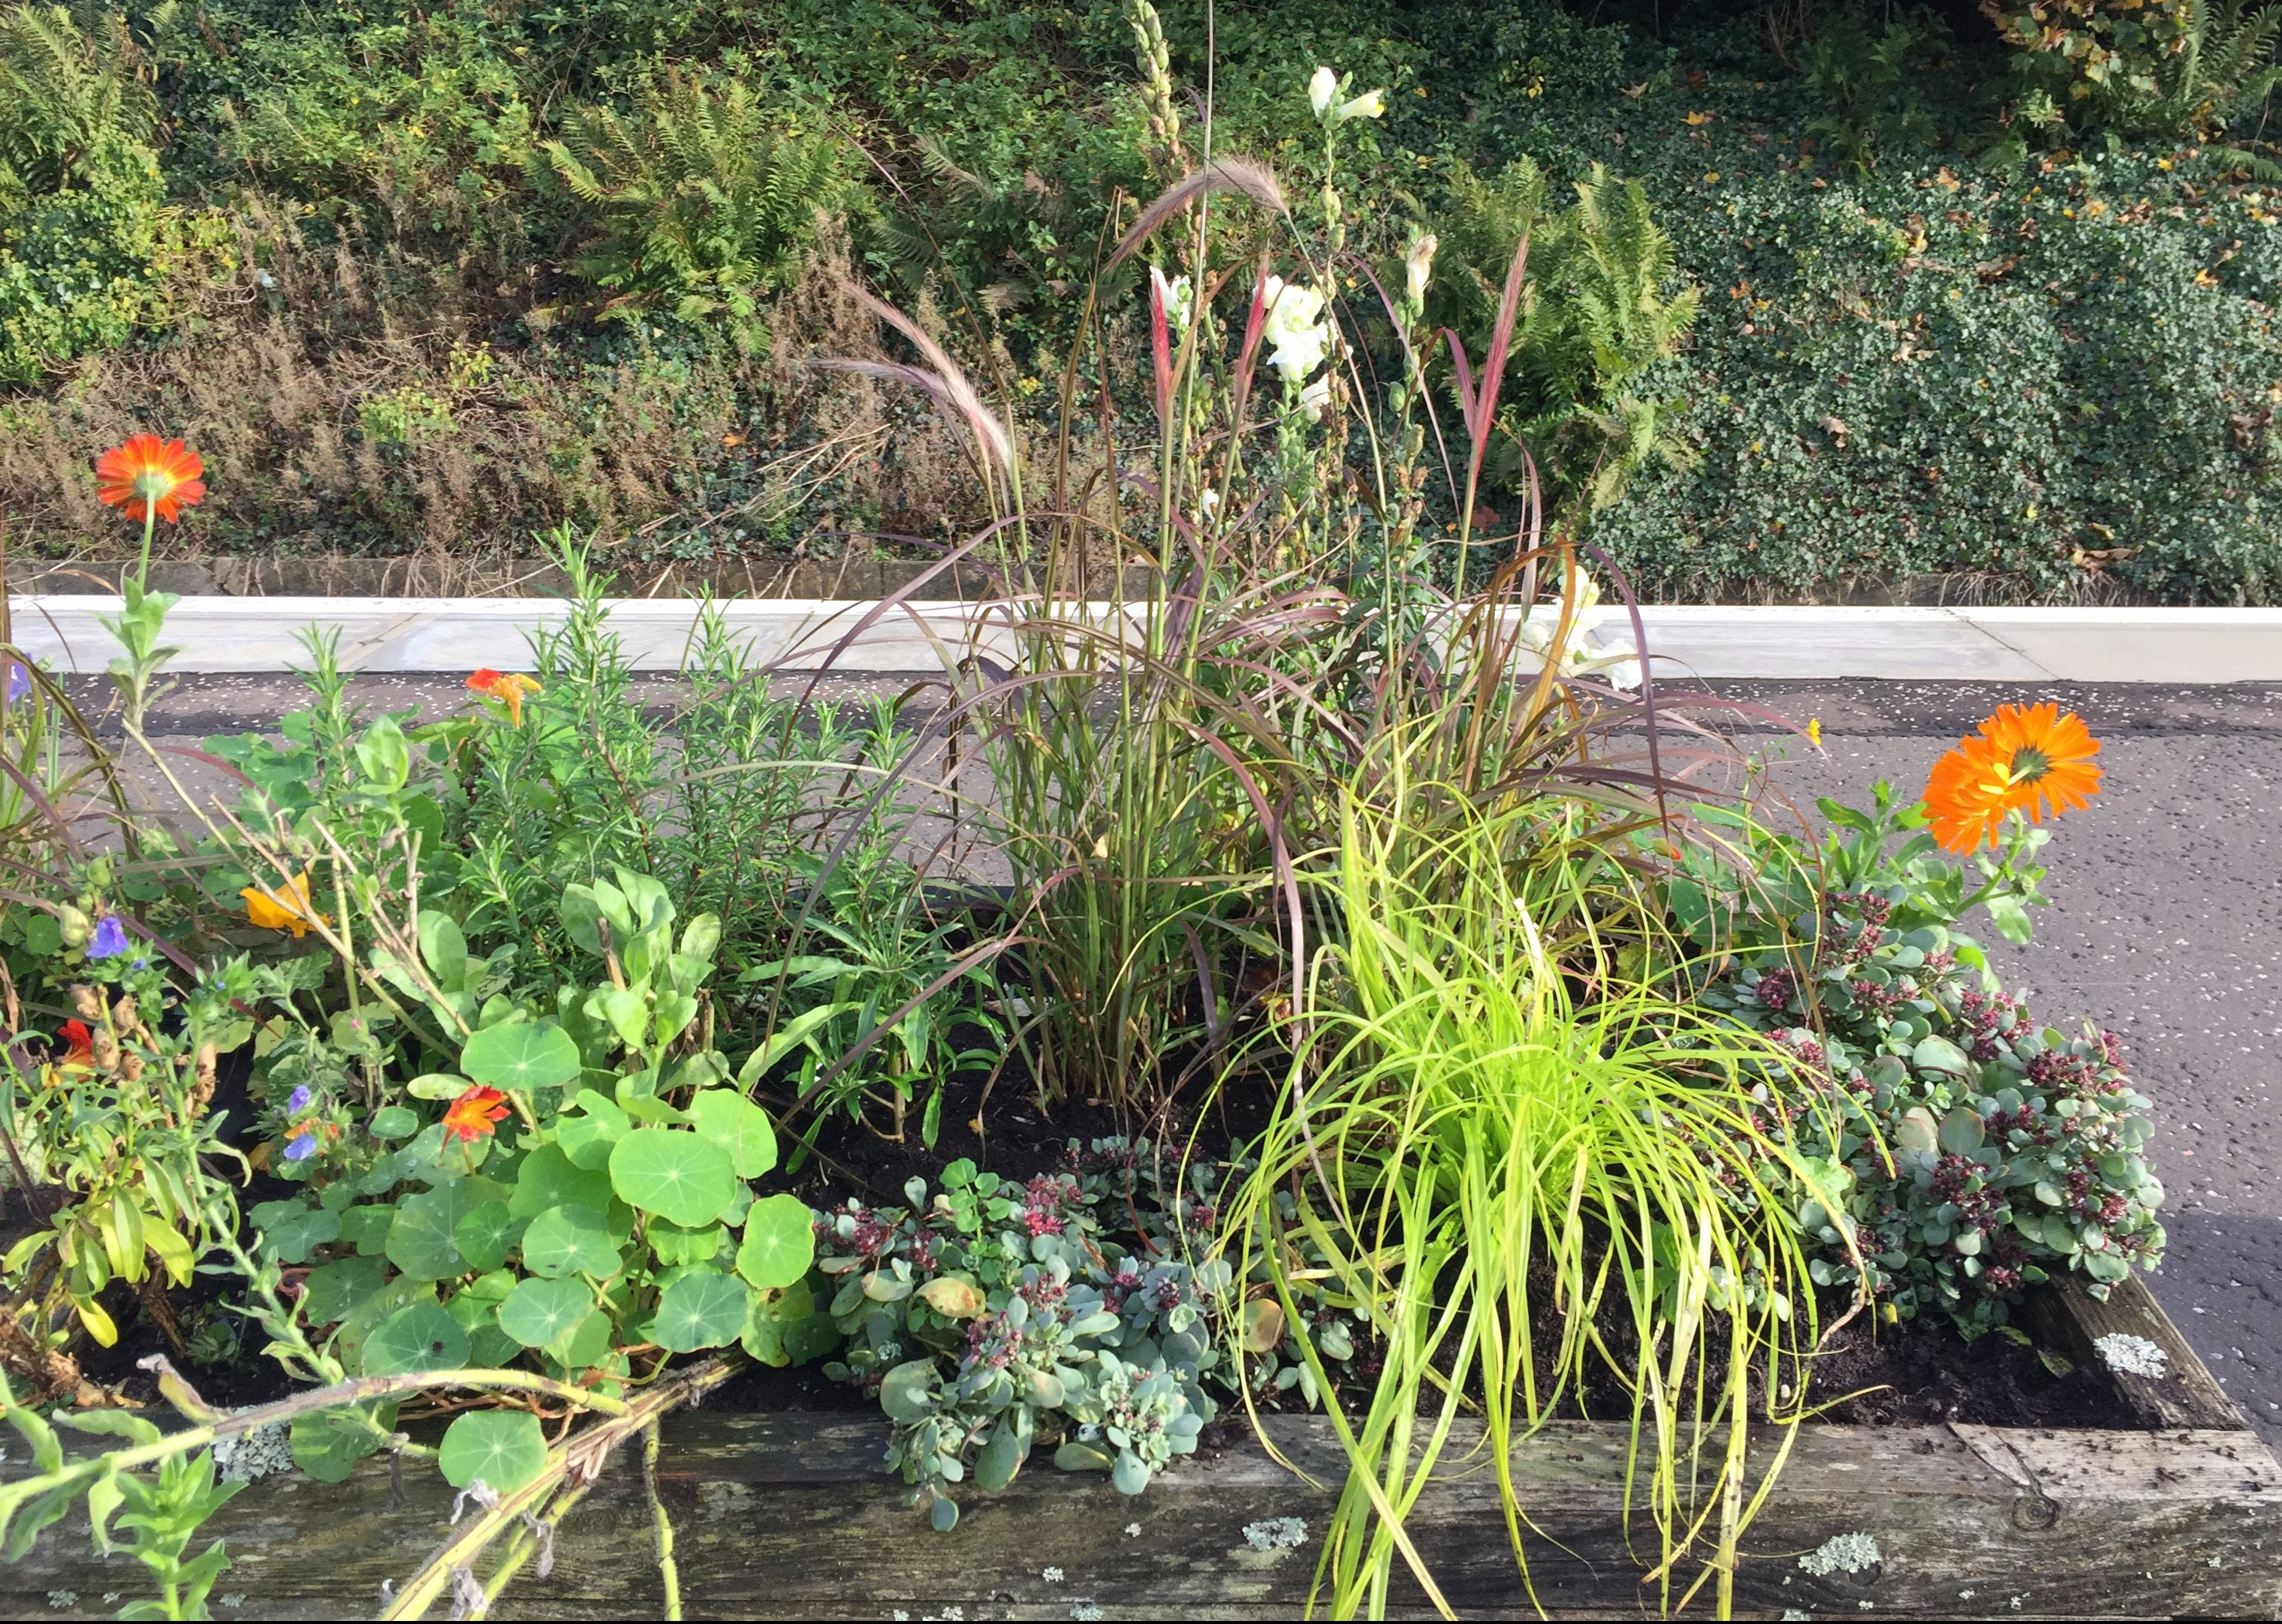 Scotrail planters